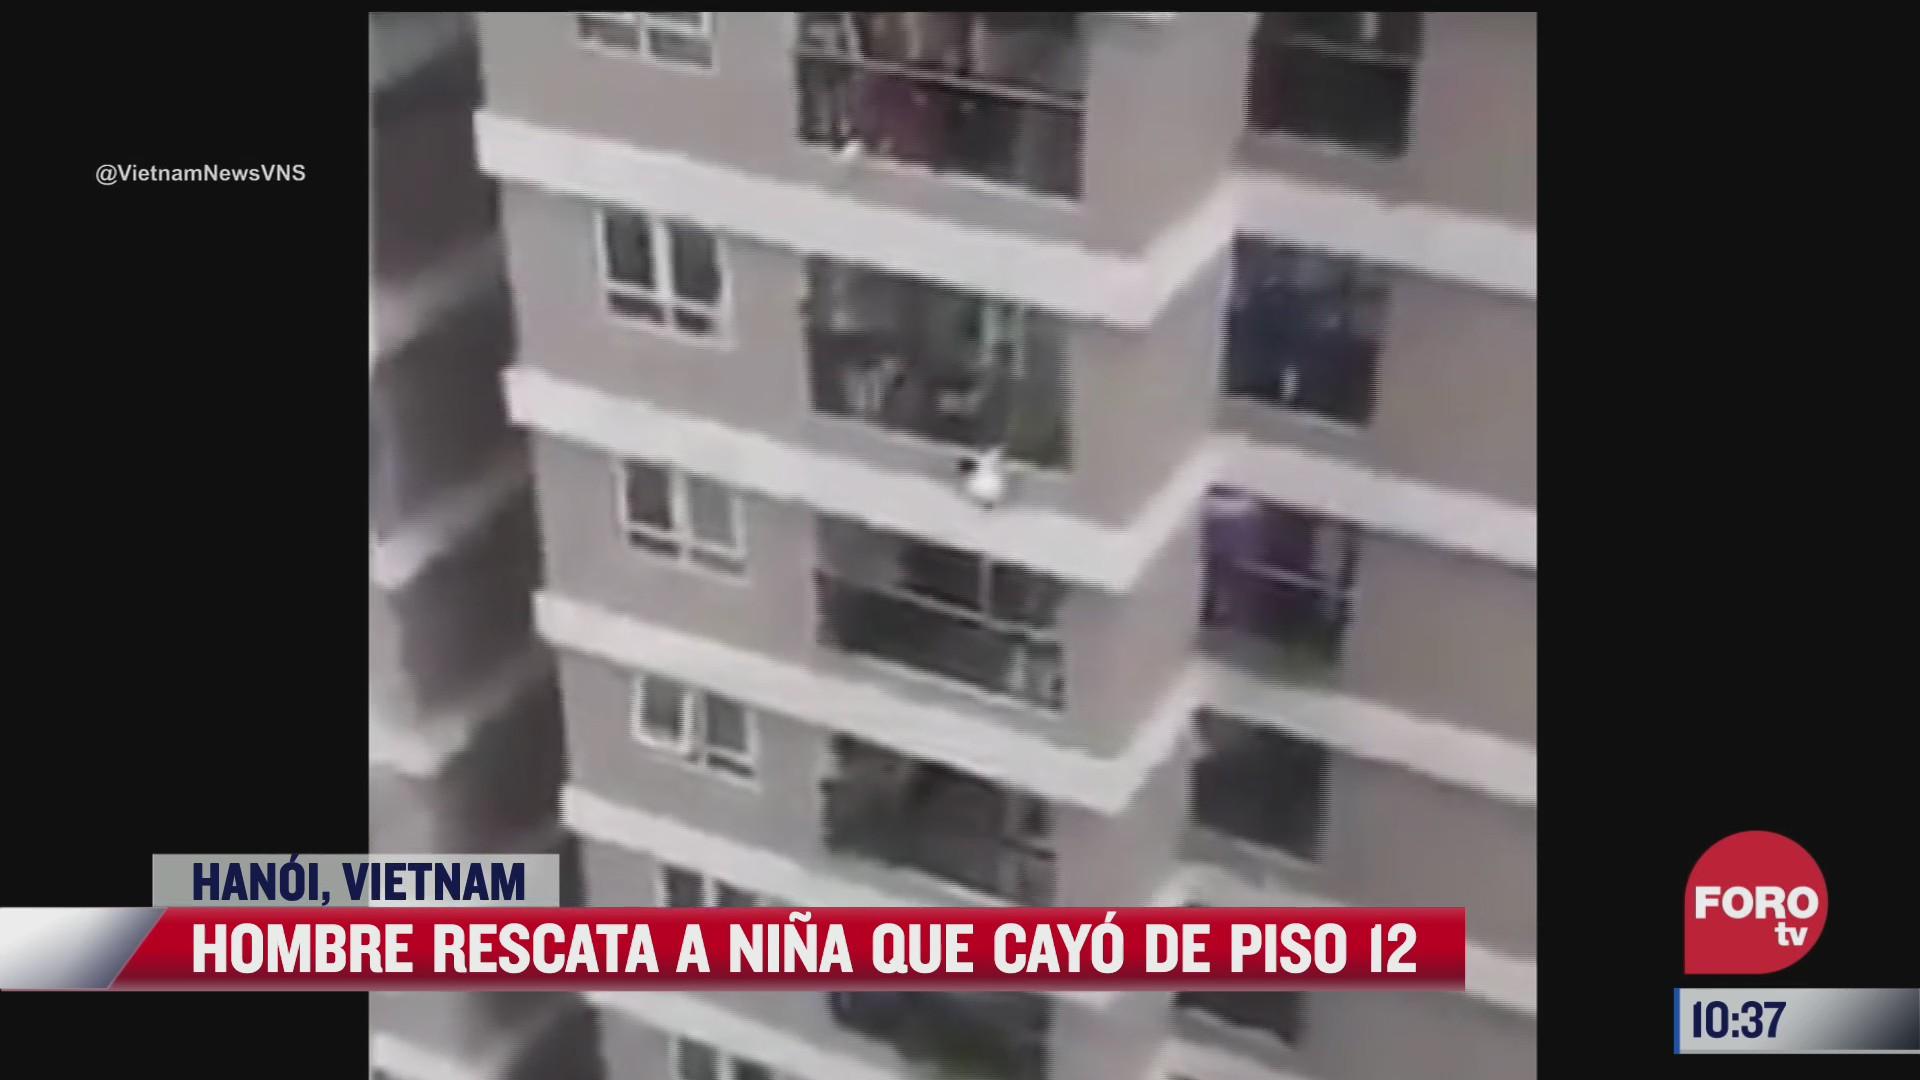 hombre rescata a nina que cayo de piso 12 en vietnam